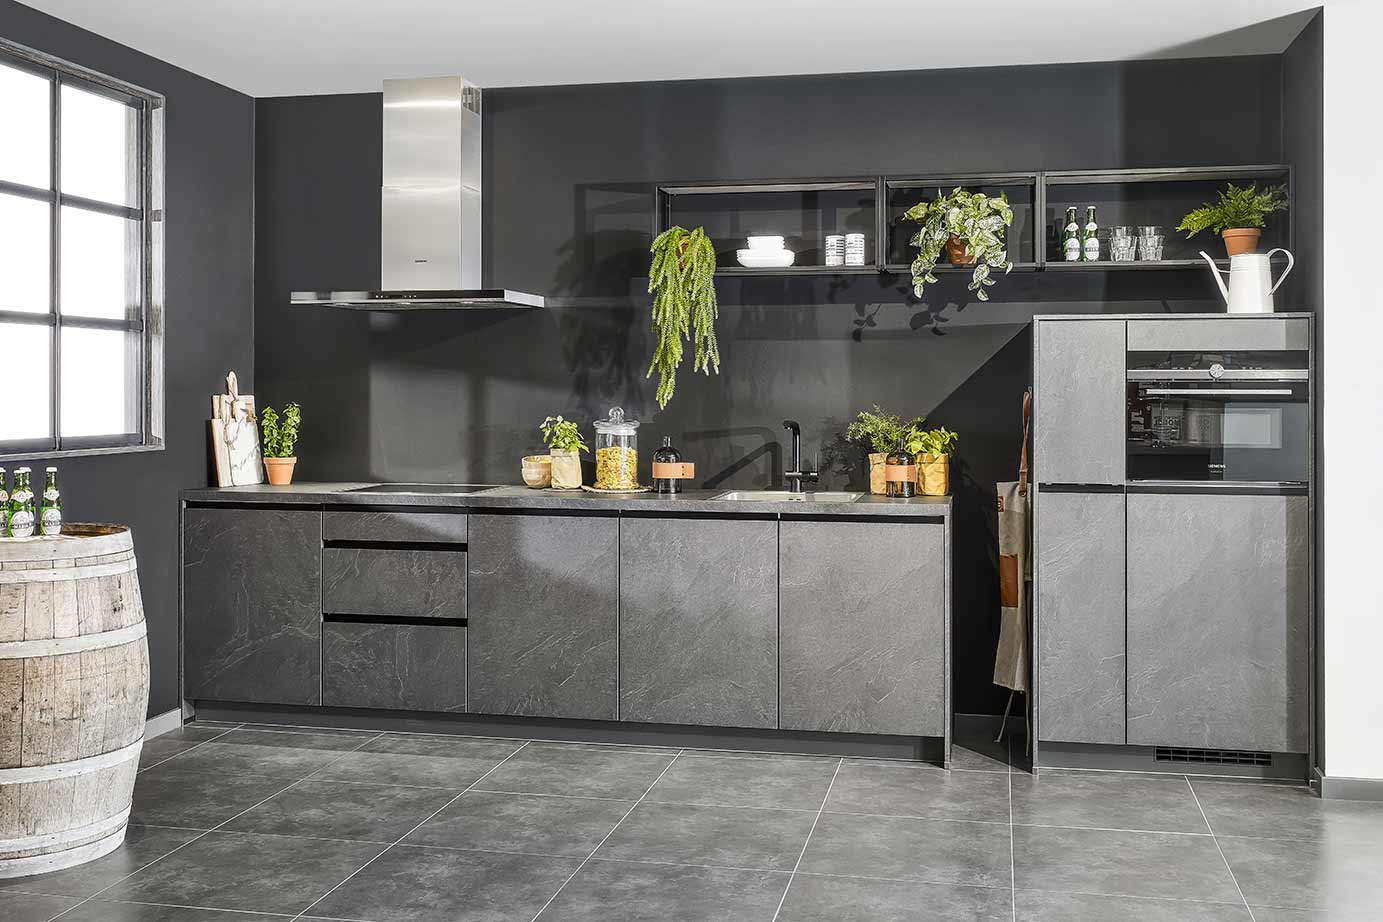 Keuken Apparatuur Merken : Dbselect keukens hoge kwaliteit voor lage prijs db keukens